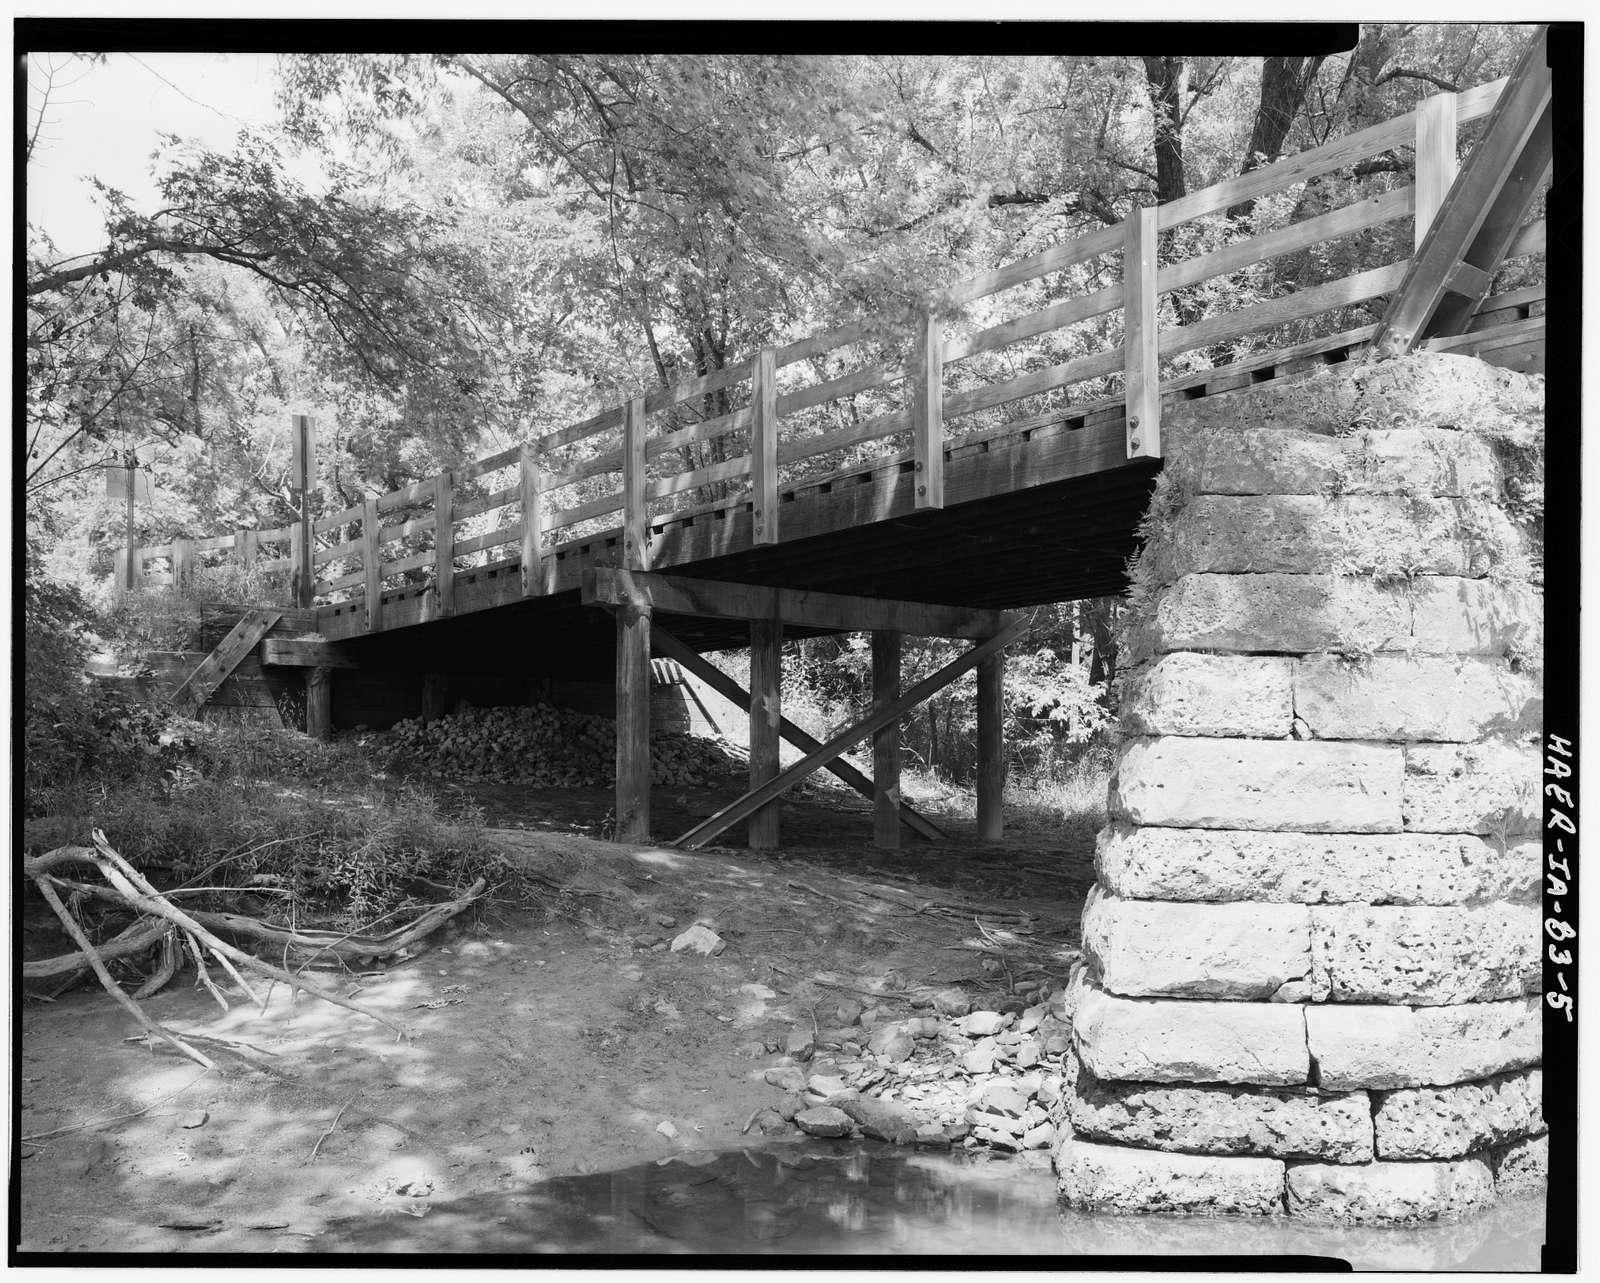 Upper Paris Bridge, Spanning Wapsipinicon River at Sutton Road, Paris, Linn County, IA